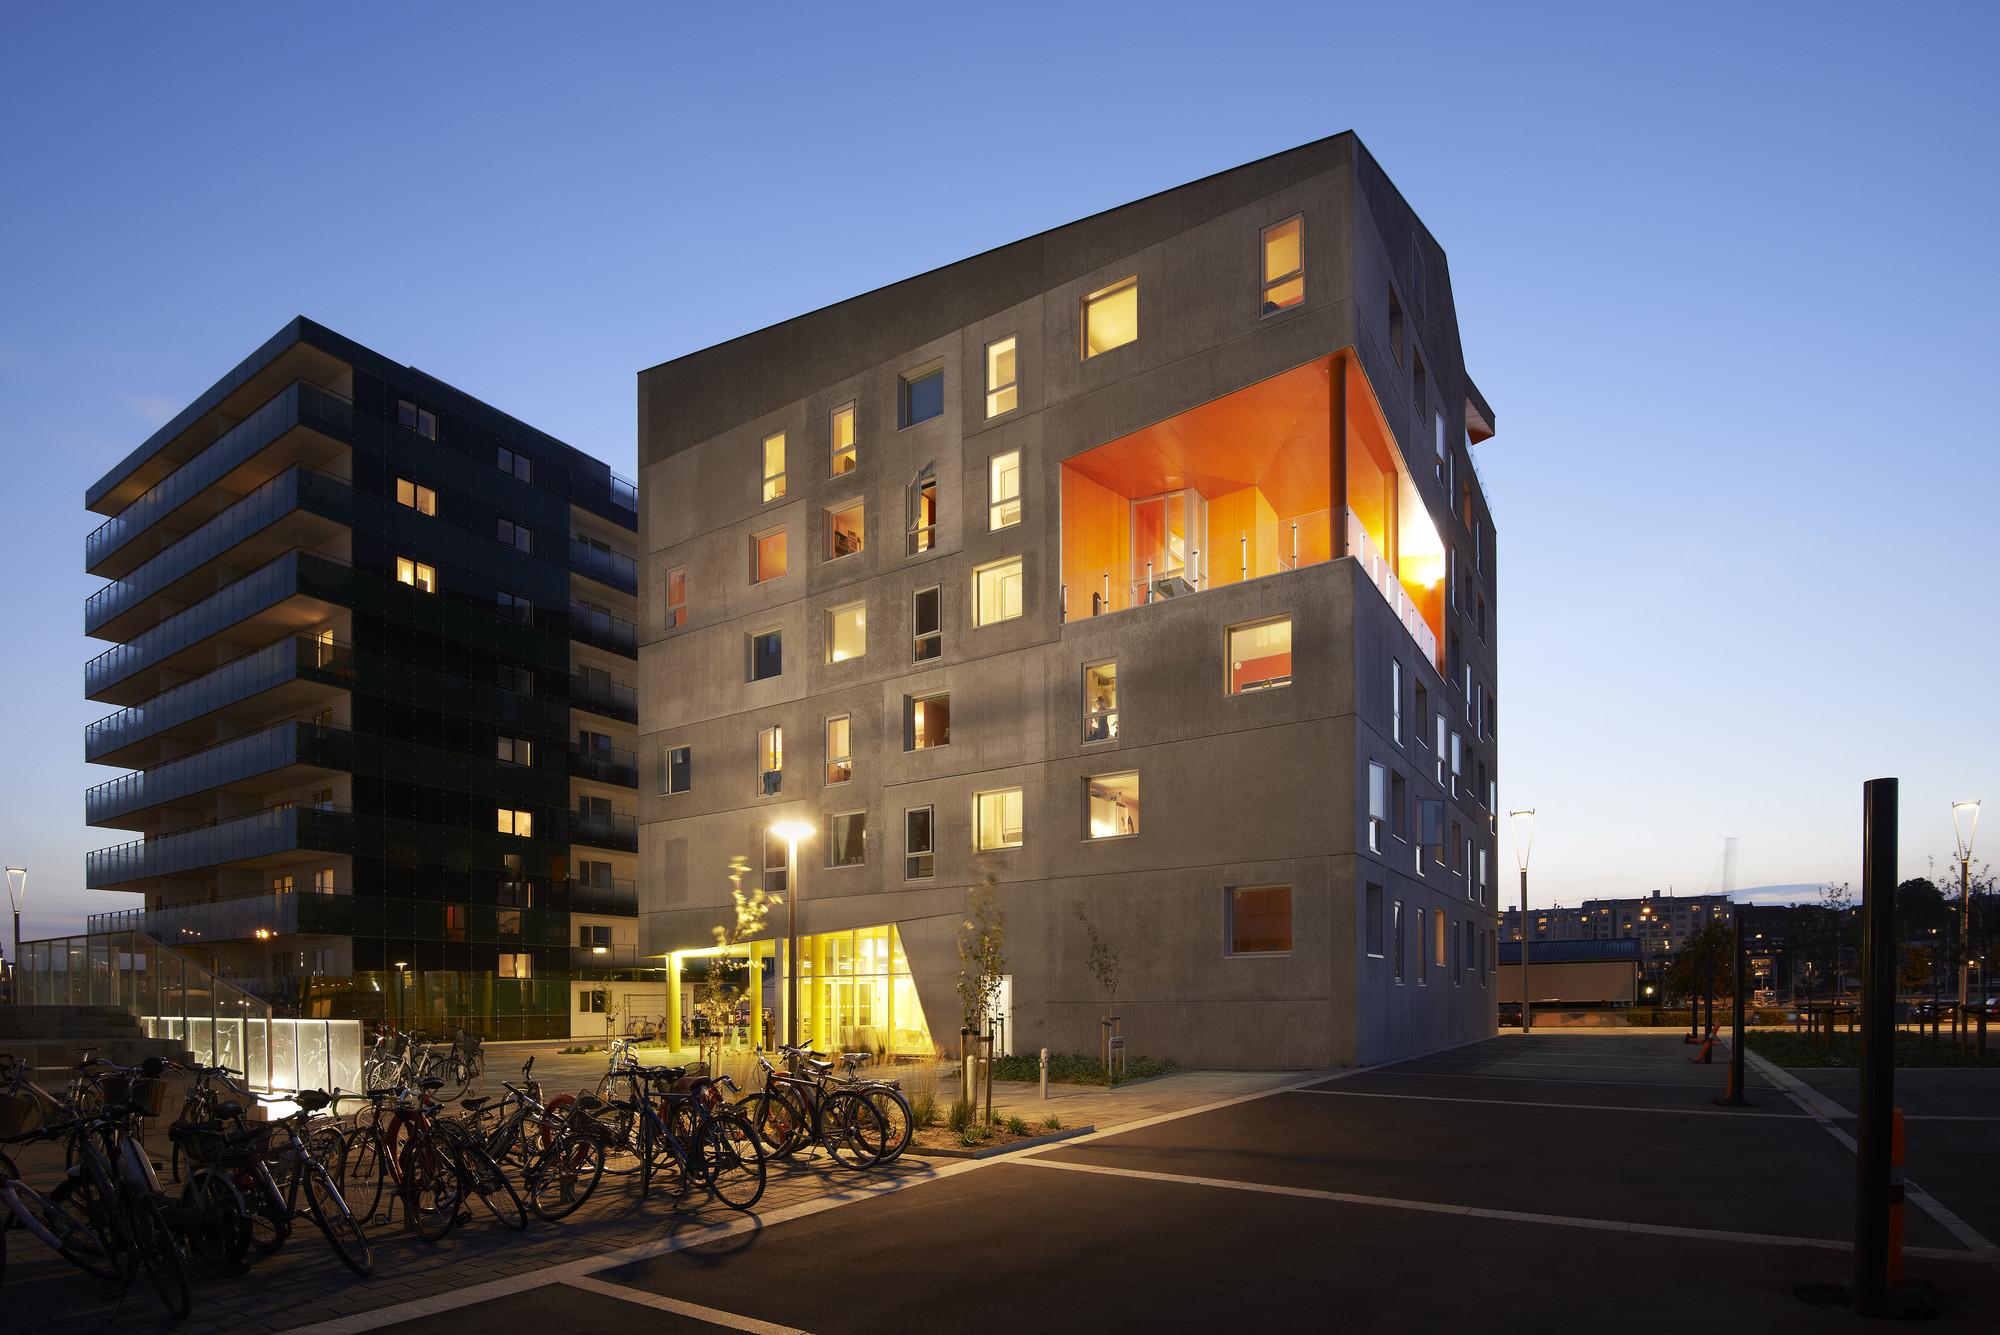 Energy neutral youth housing at the Port of Aarhus / CUBO Arkitekter + TERROIR, Courtesy of CUBO Arkitekter + TERROIR